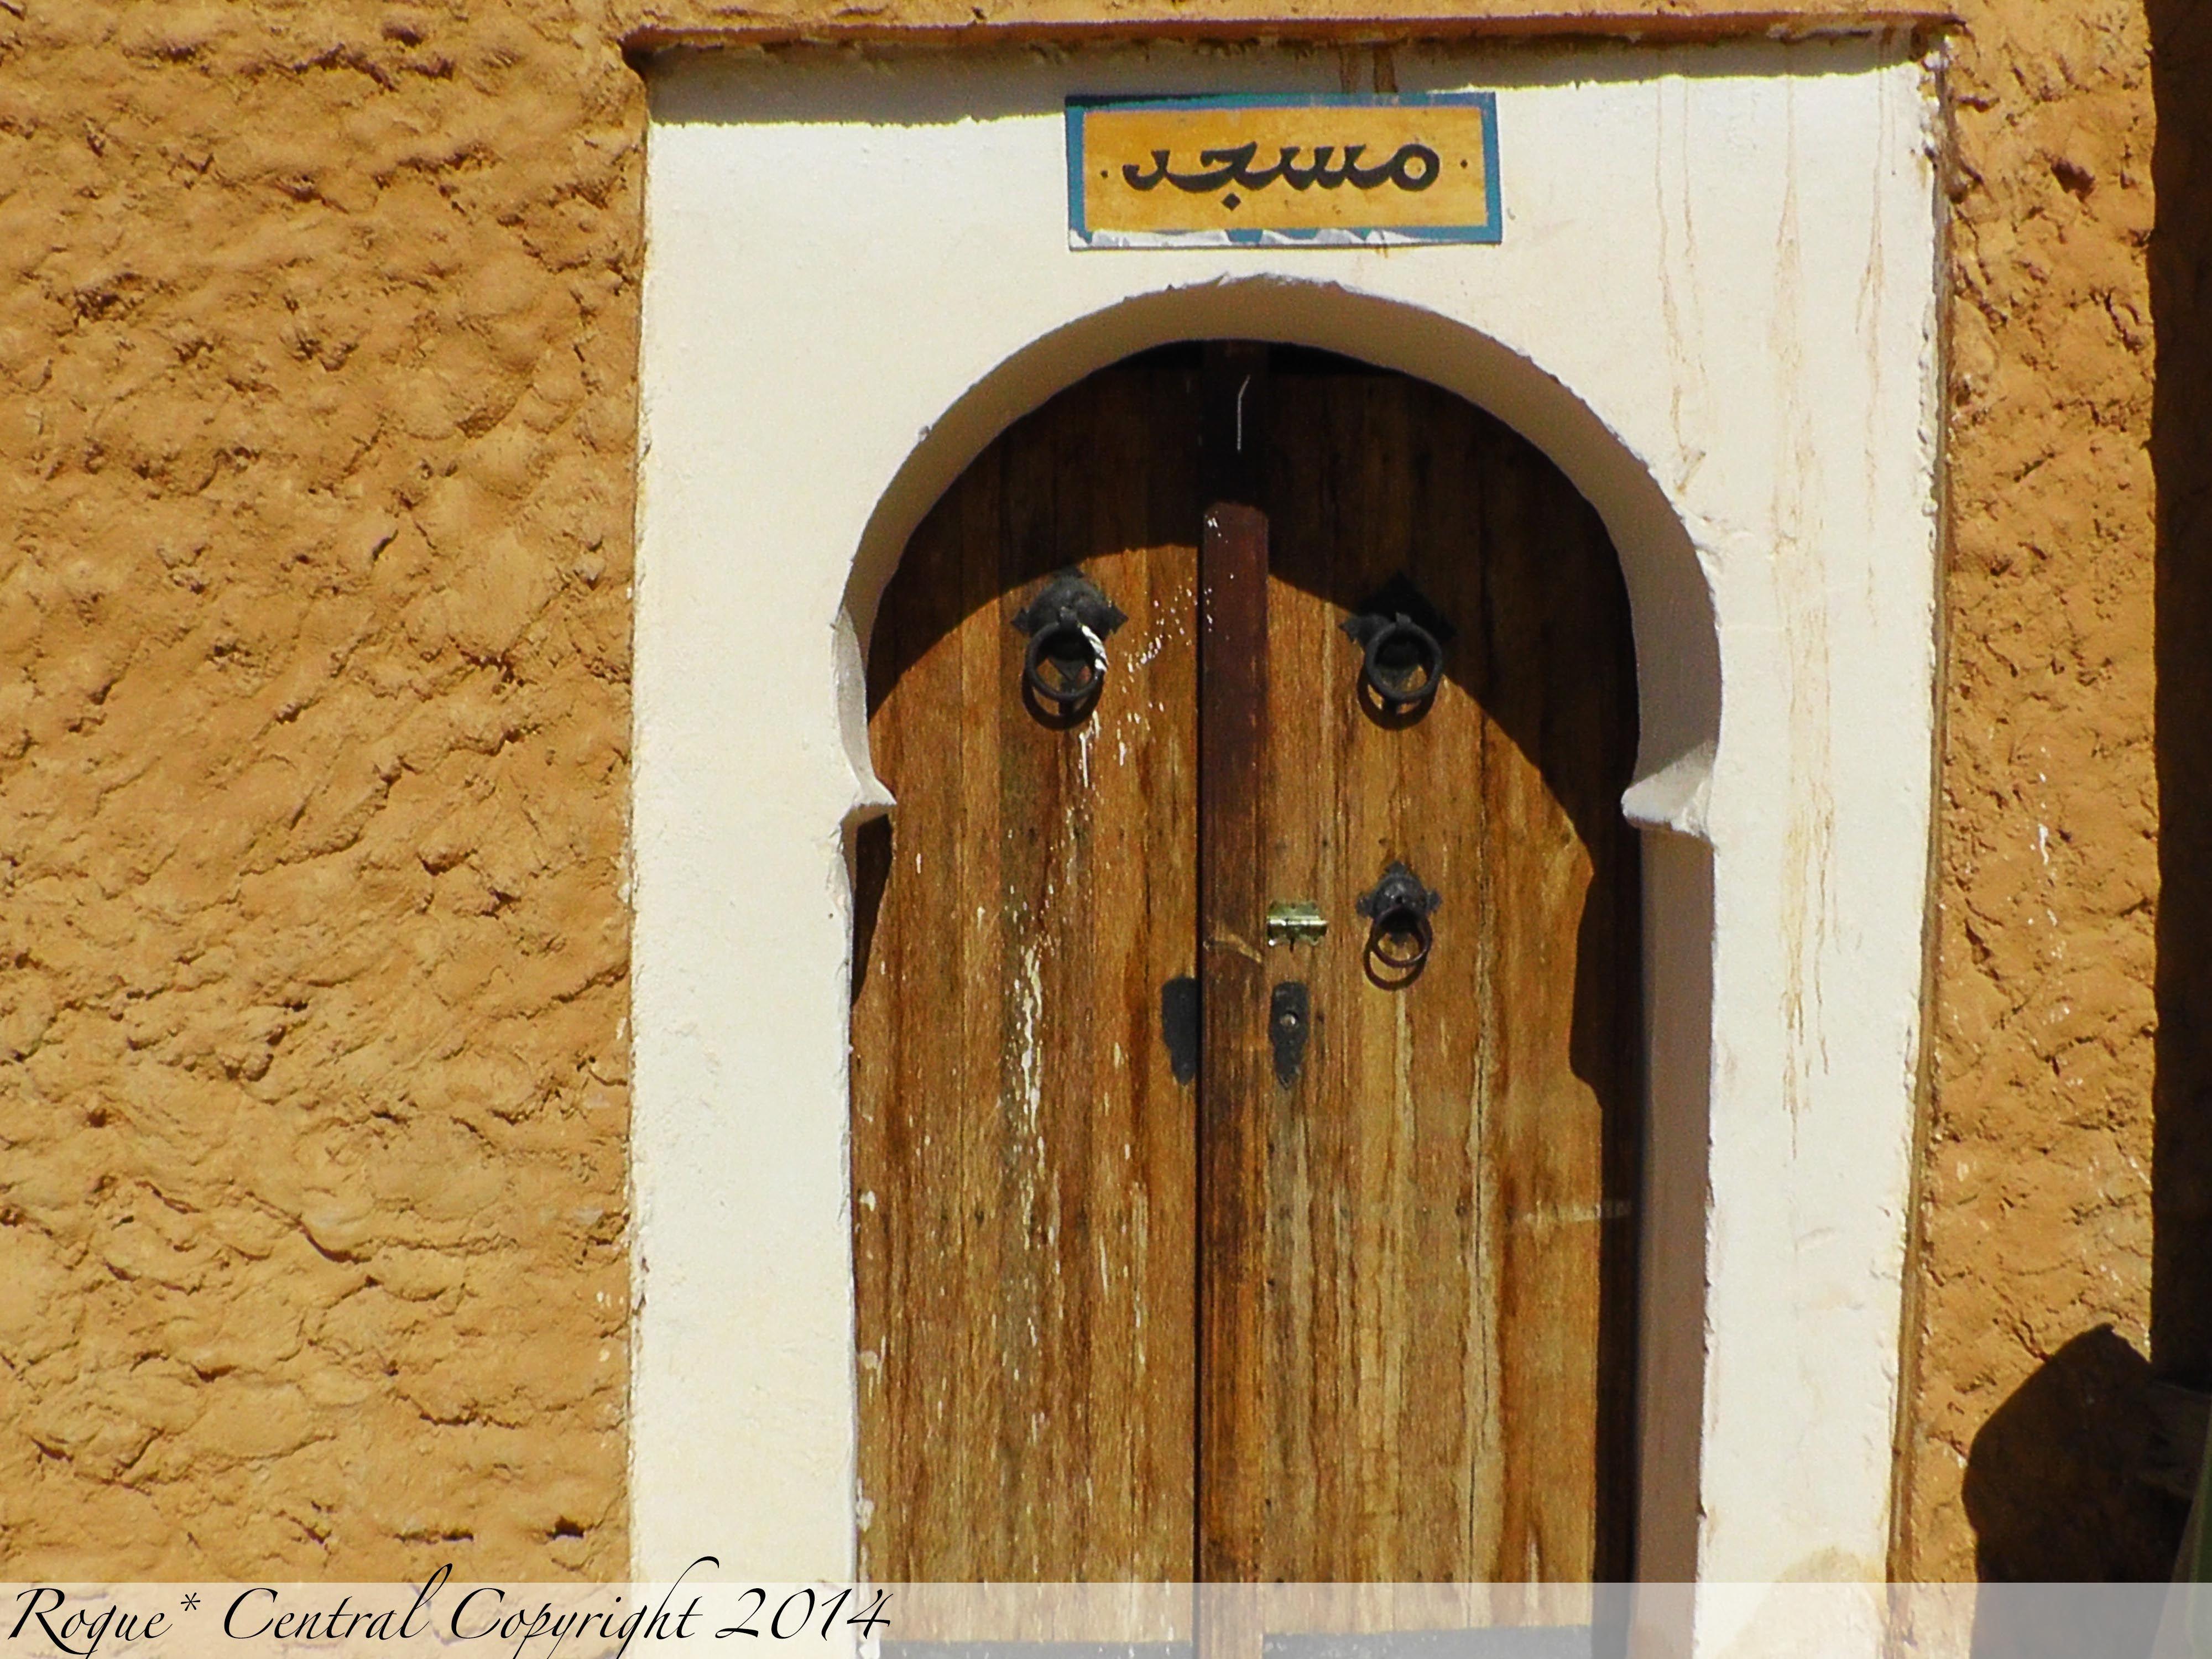 Masjid Door by Mairy Hussain & Masjid Door by Mairy Hussain | My Photography | Pinterest